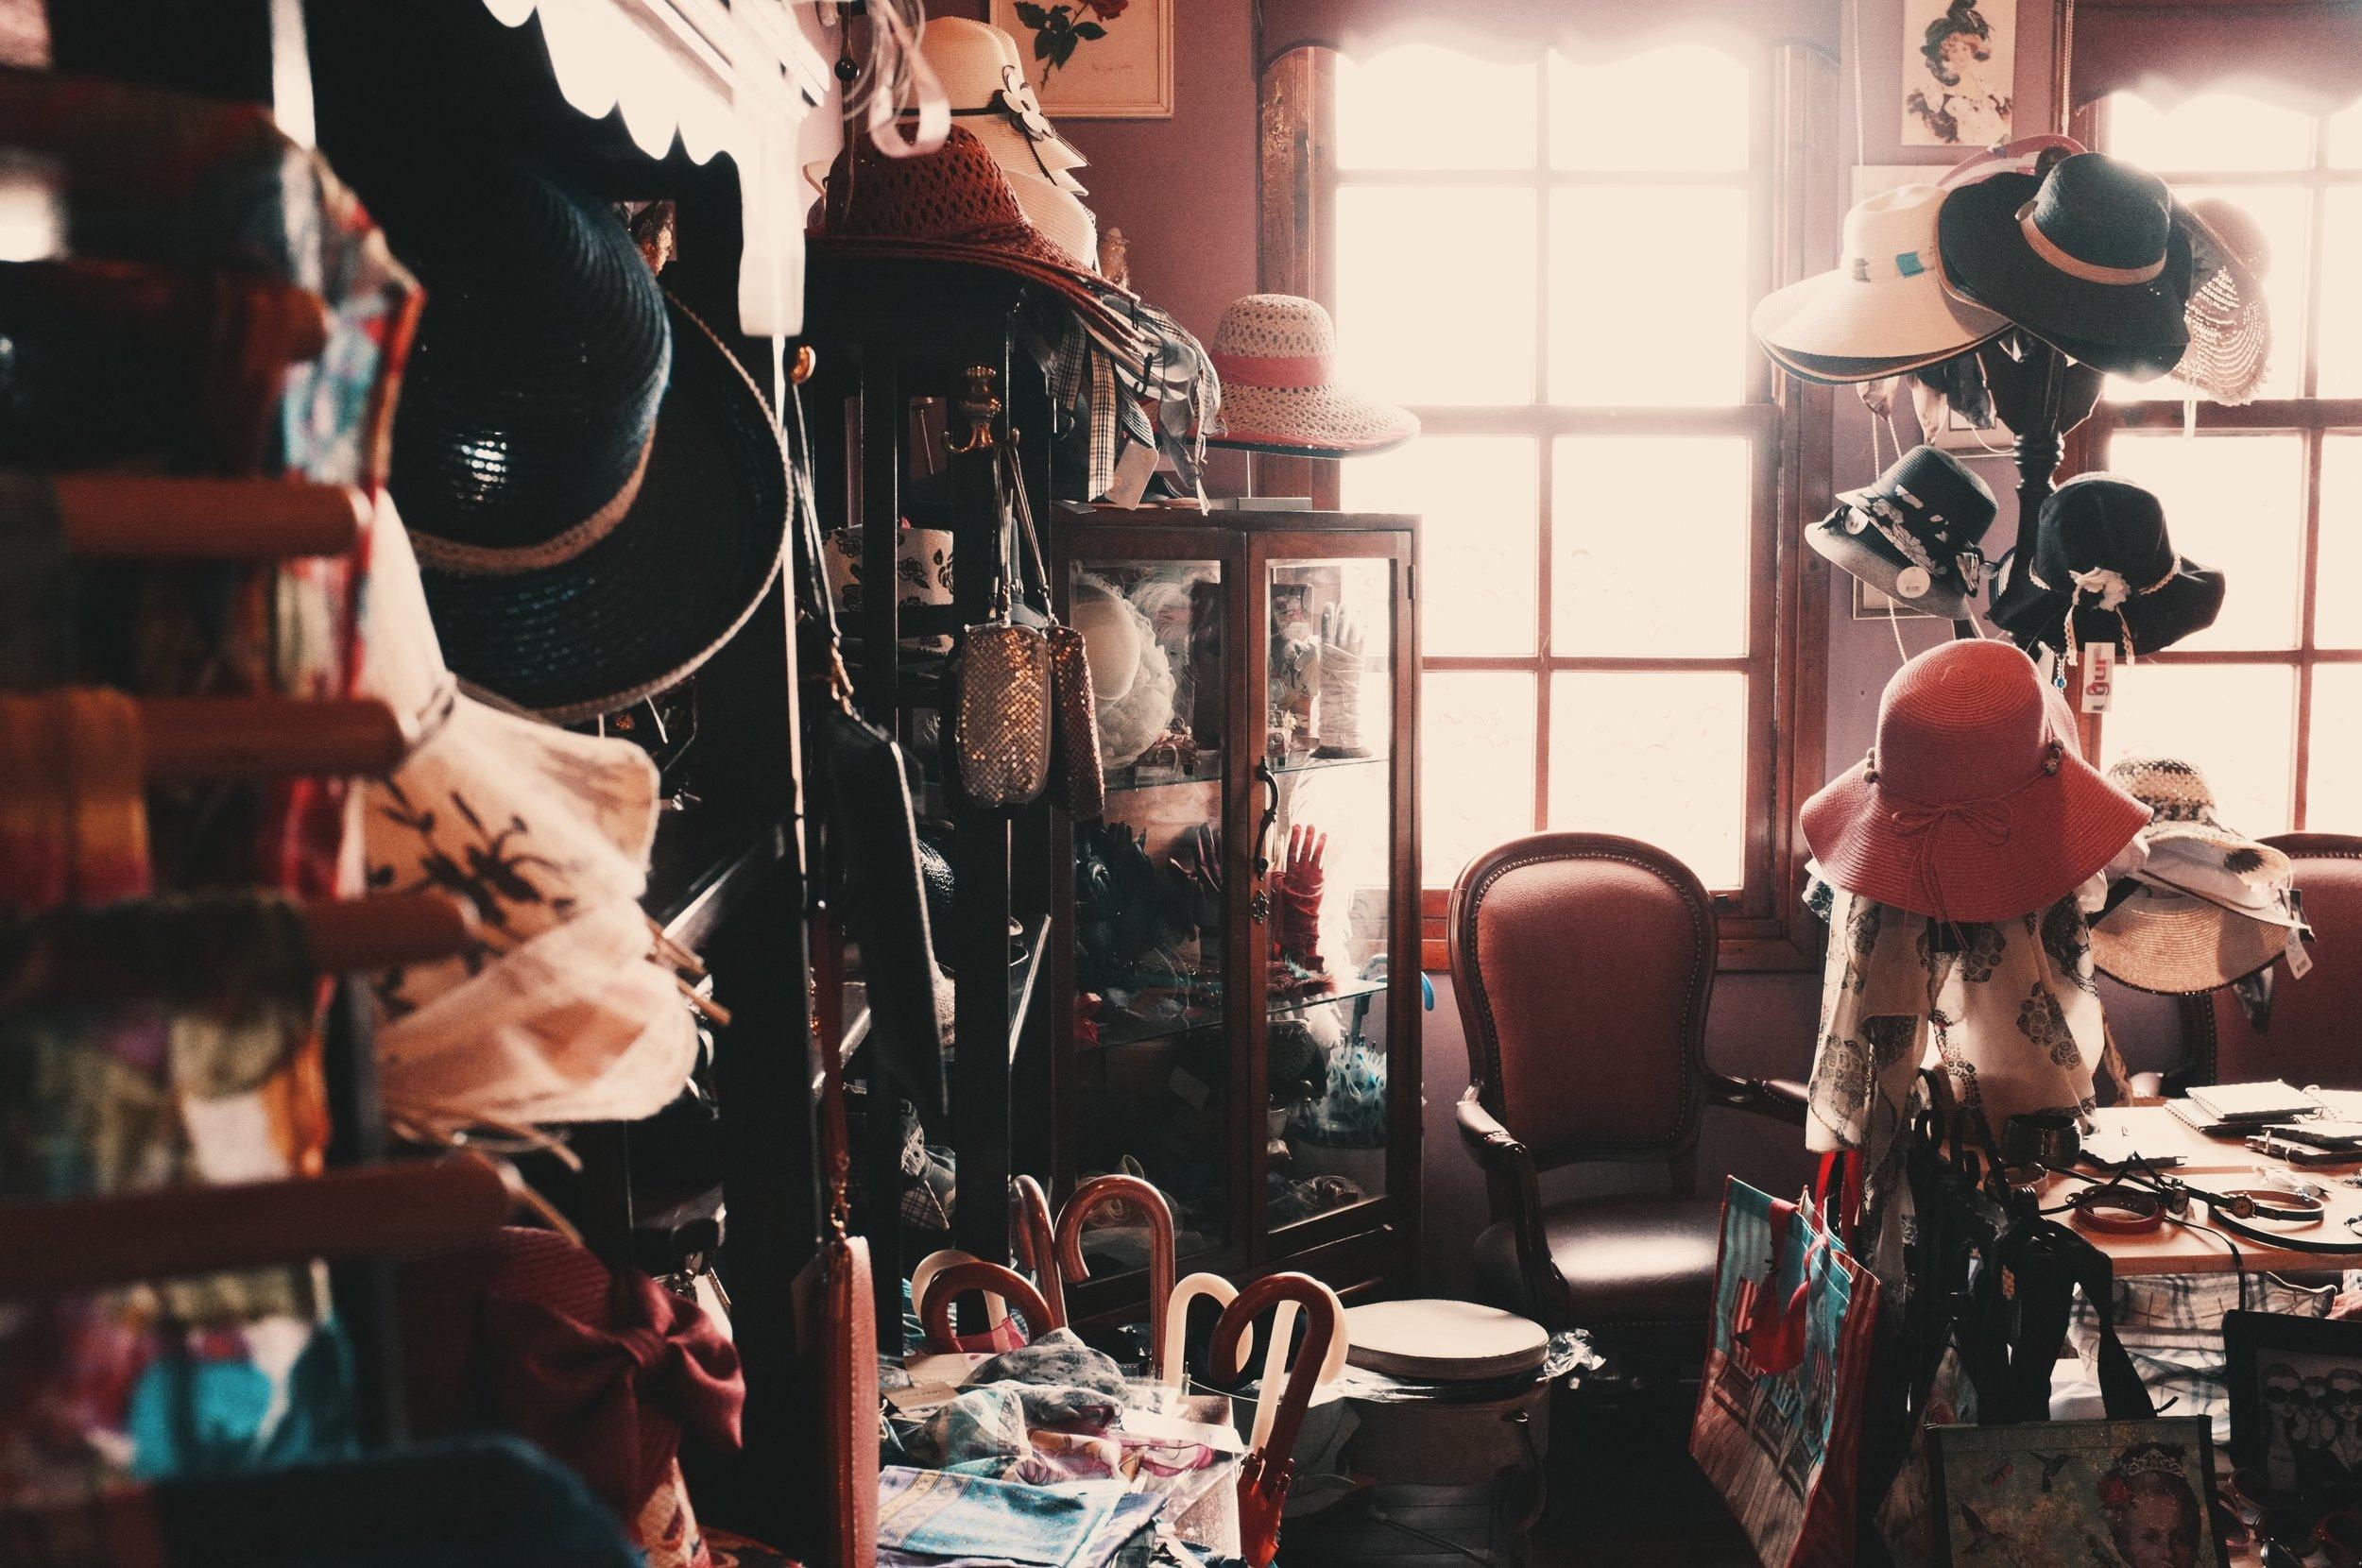 Messy room hoarder